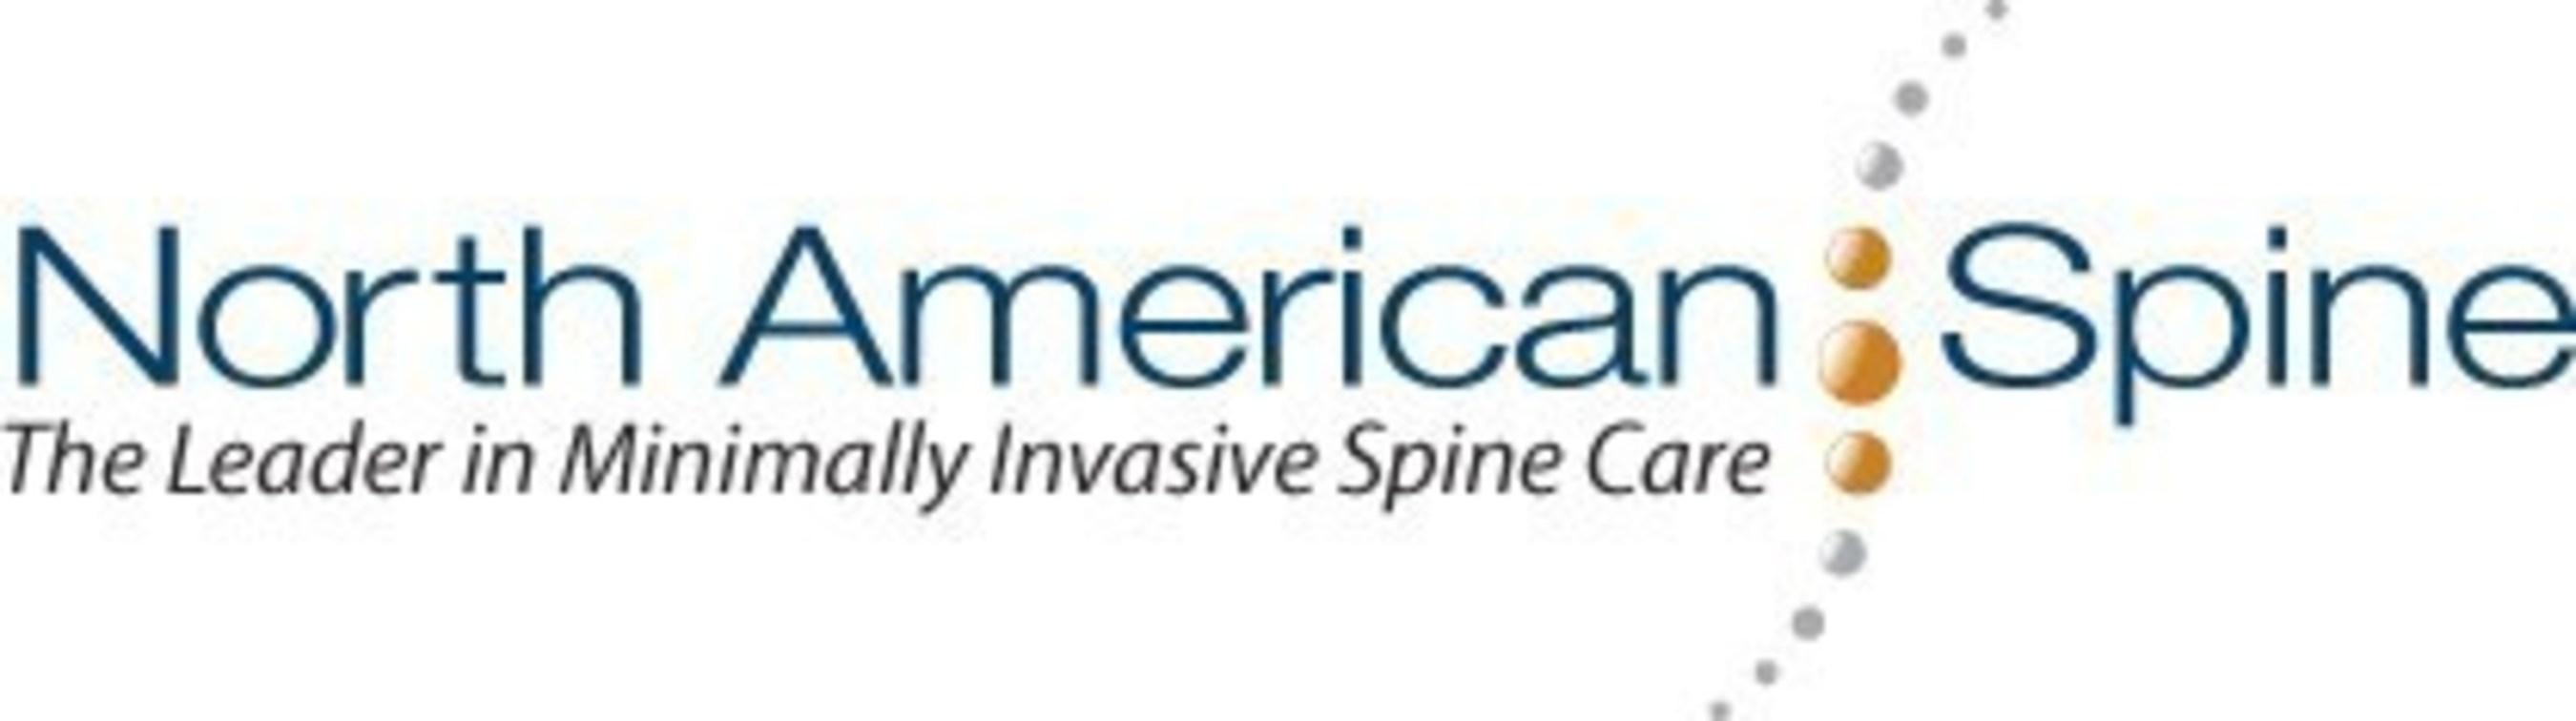 North American Spine's AccuraScope Procedure Featured on FOX43, WPMT